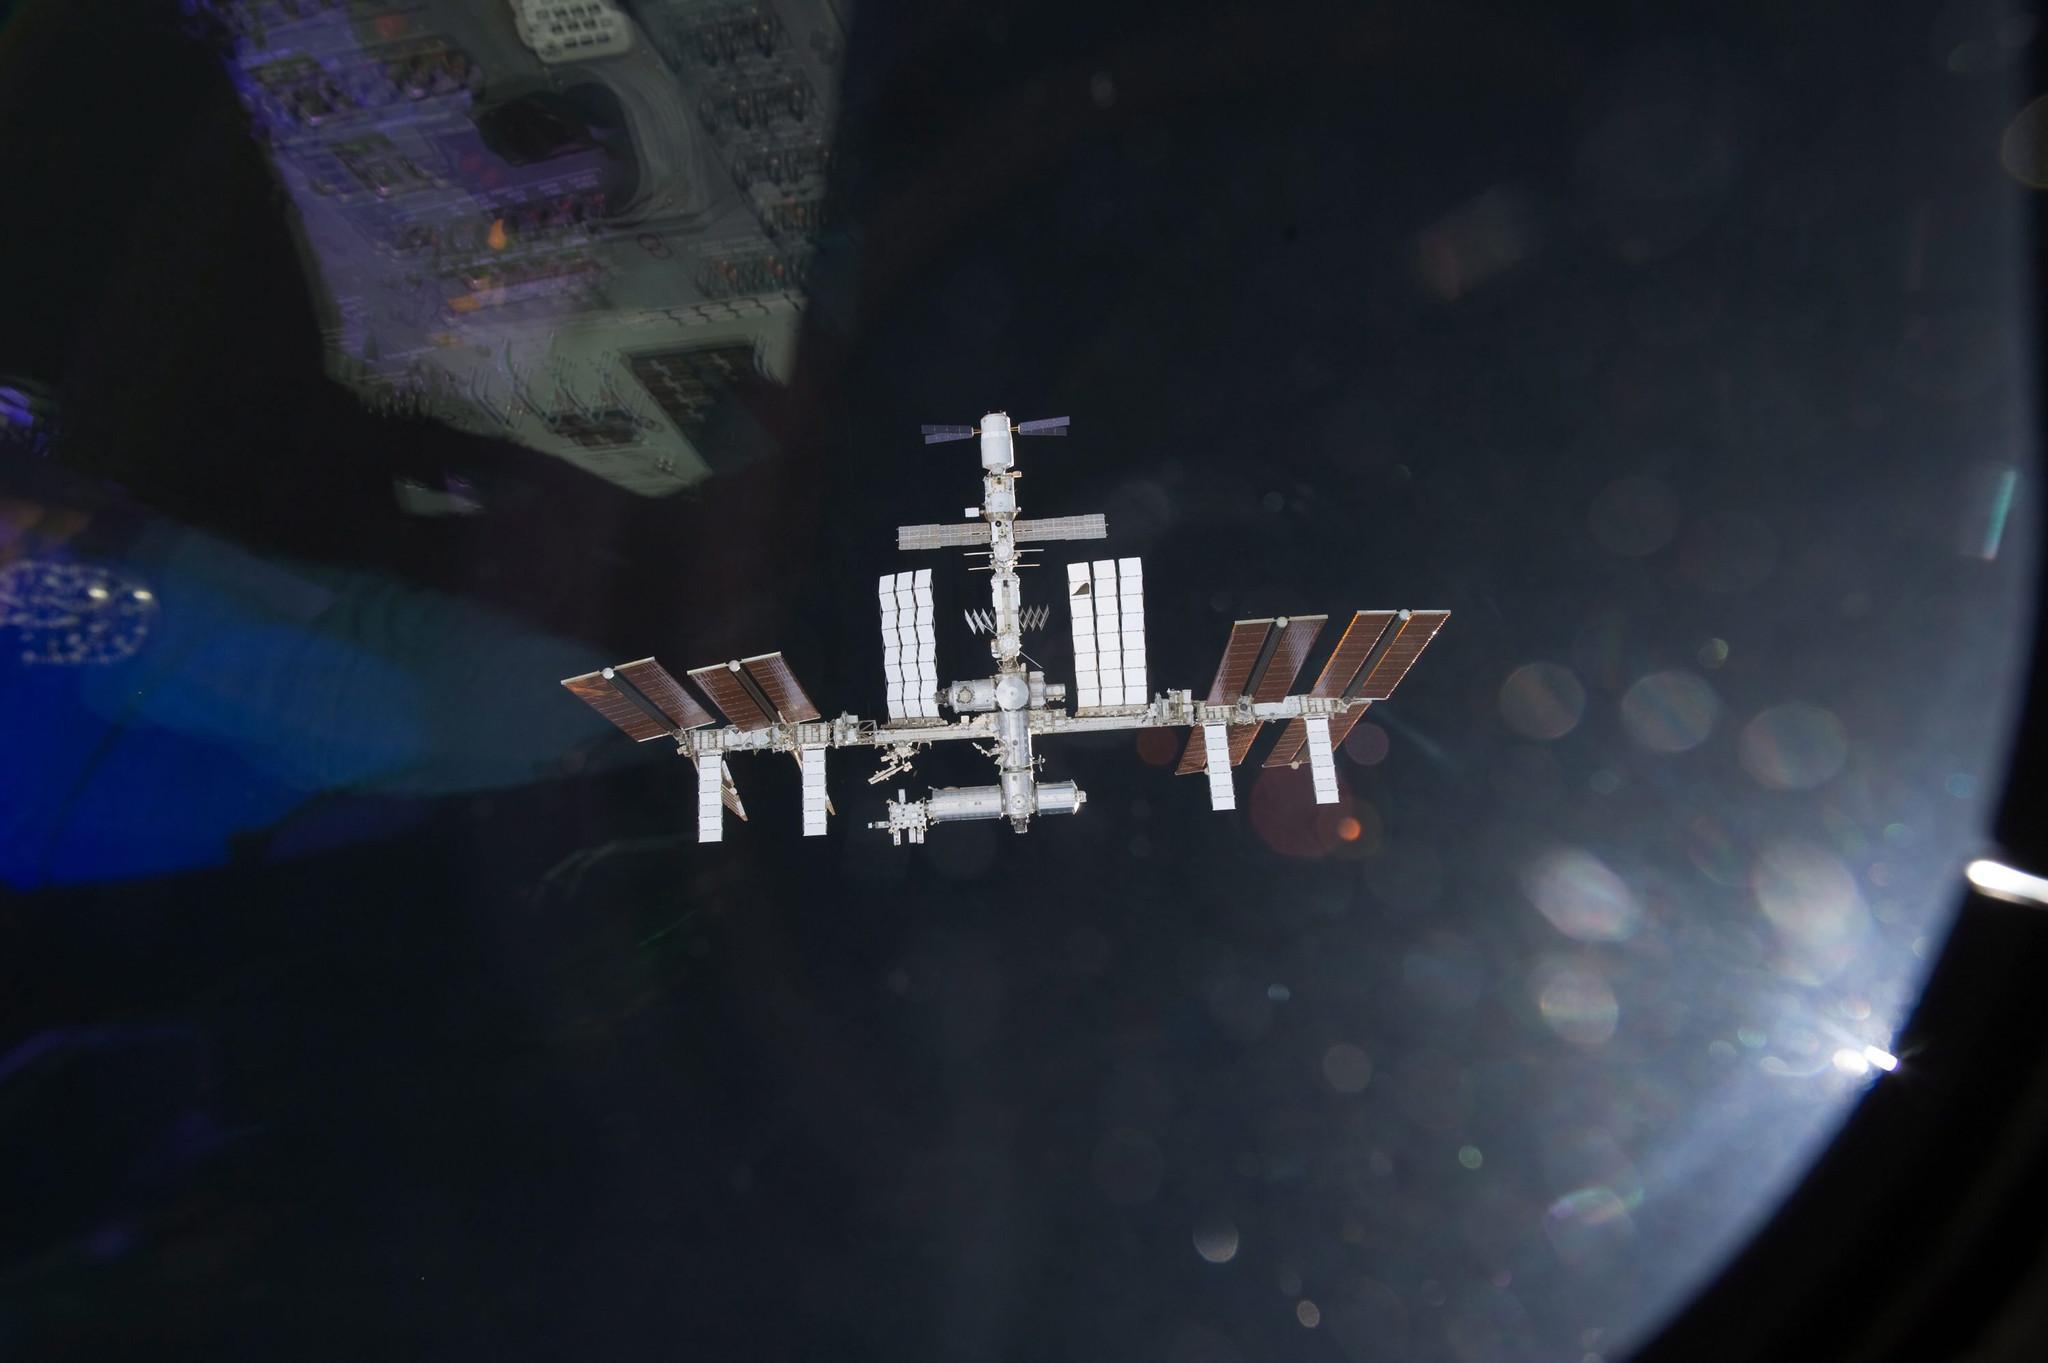 Crew evacuates U.S. segment of space station after ammonia leak